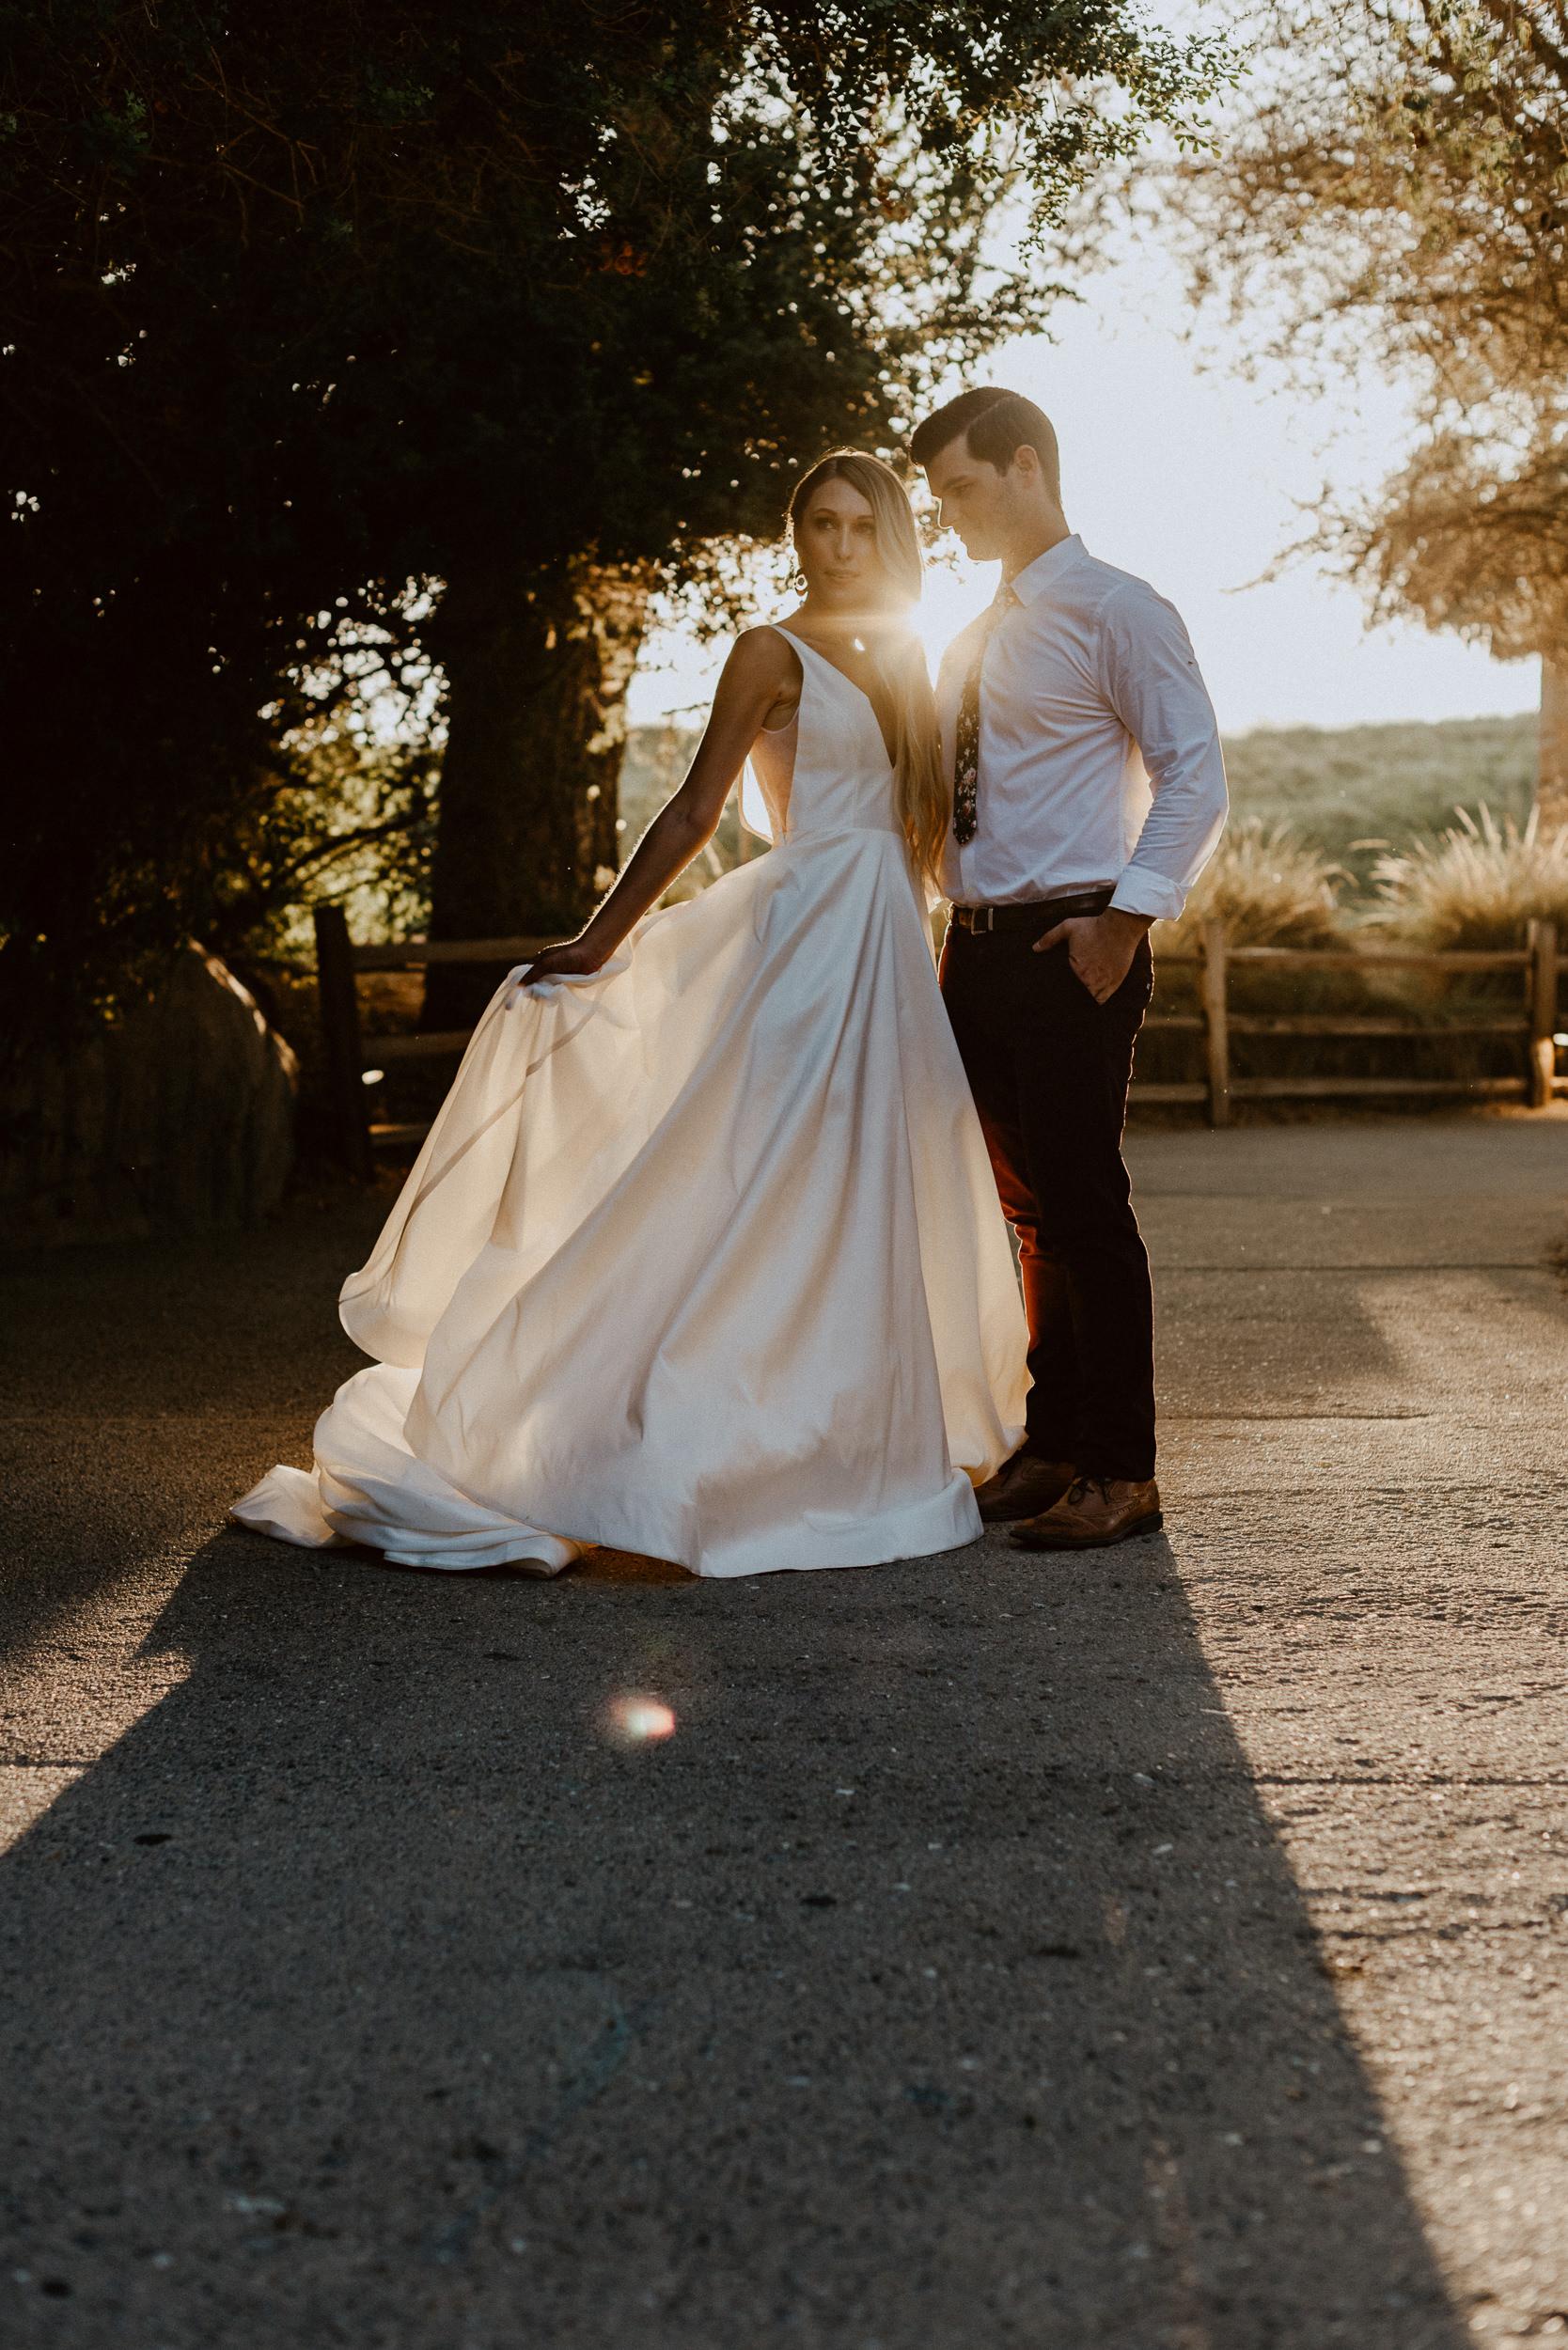 sChelsie + Chris - The Desert Shootout Wedding Romantics at The Living Desert-151.jpg